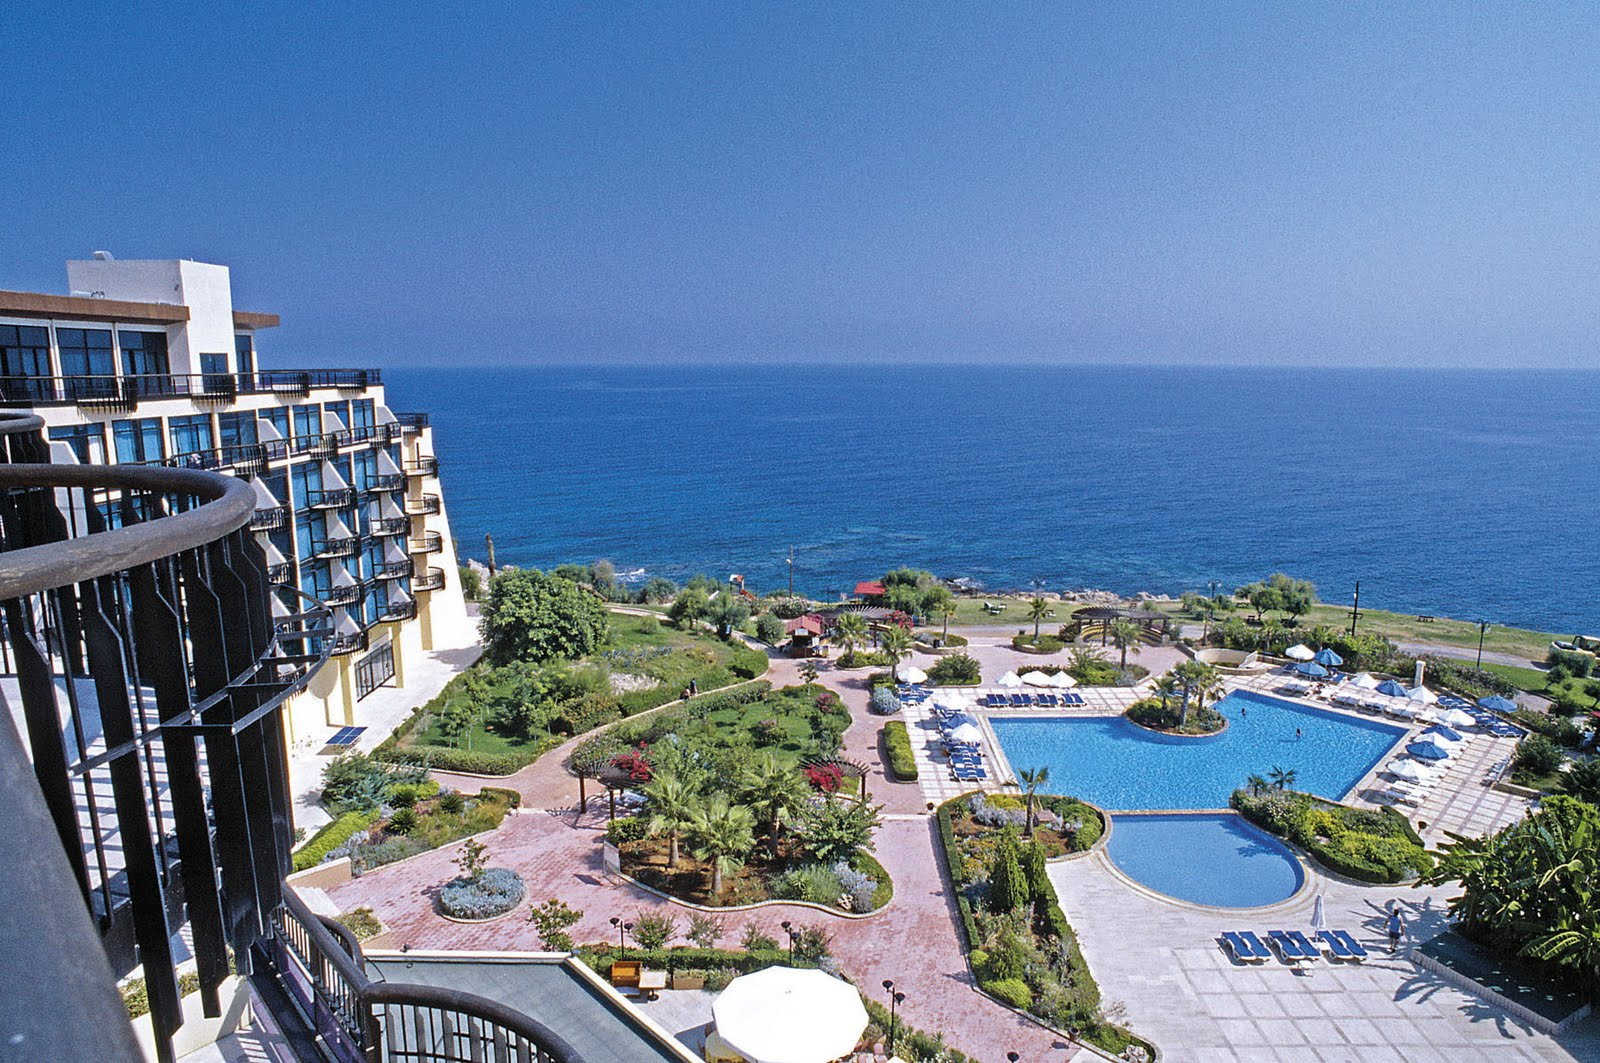 Luxotic world top ten luxury holidays worldwide for Luxury holidays worldwide